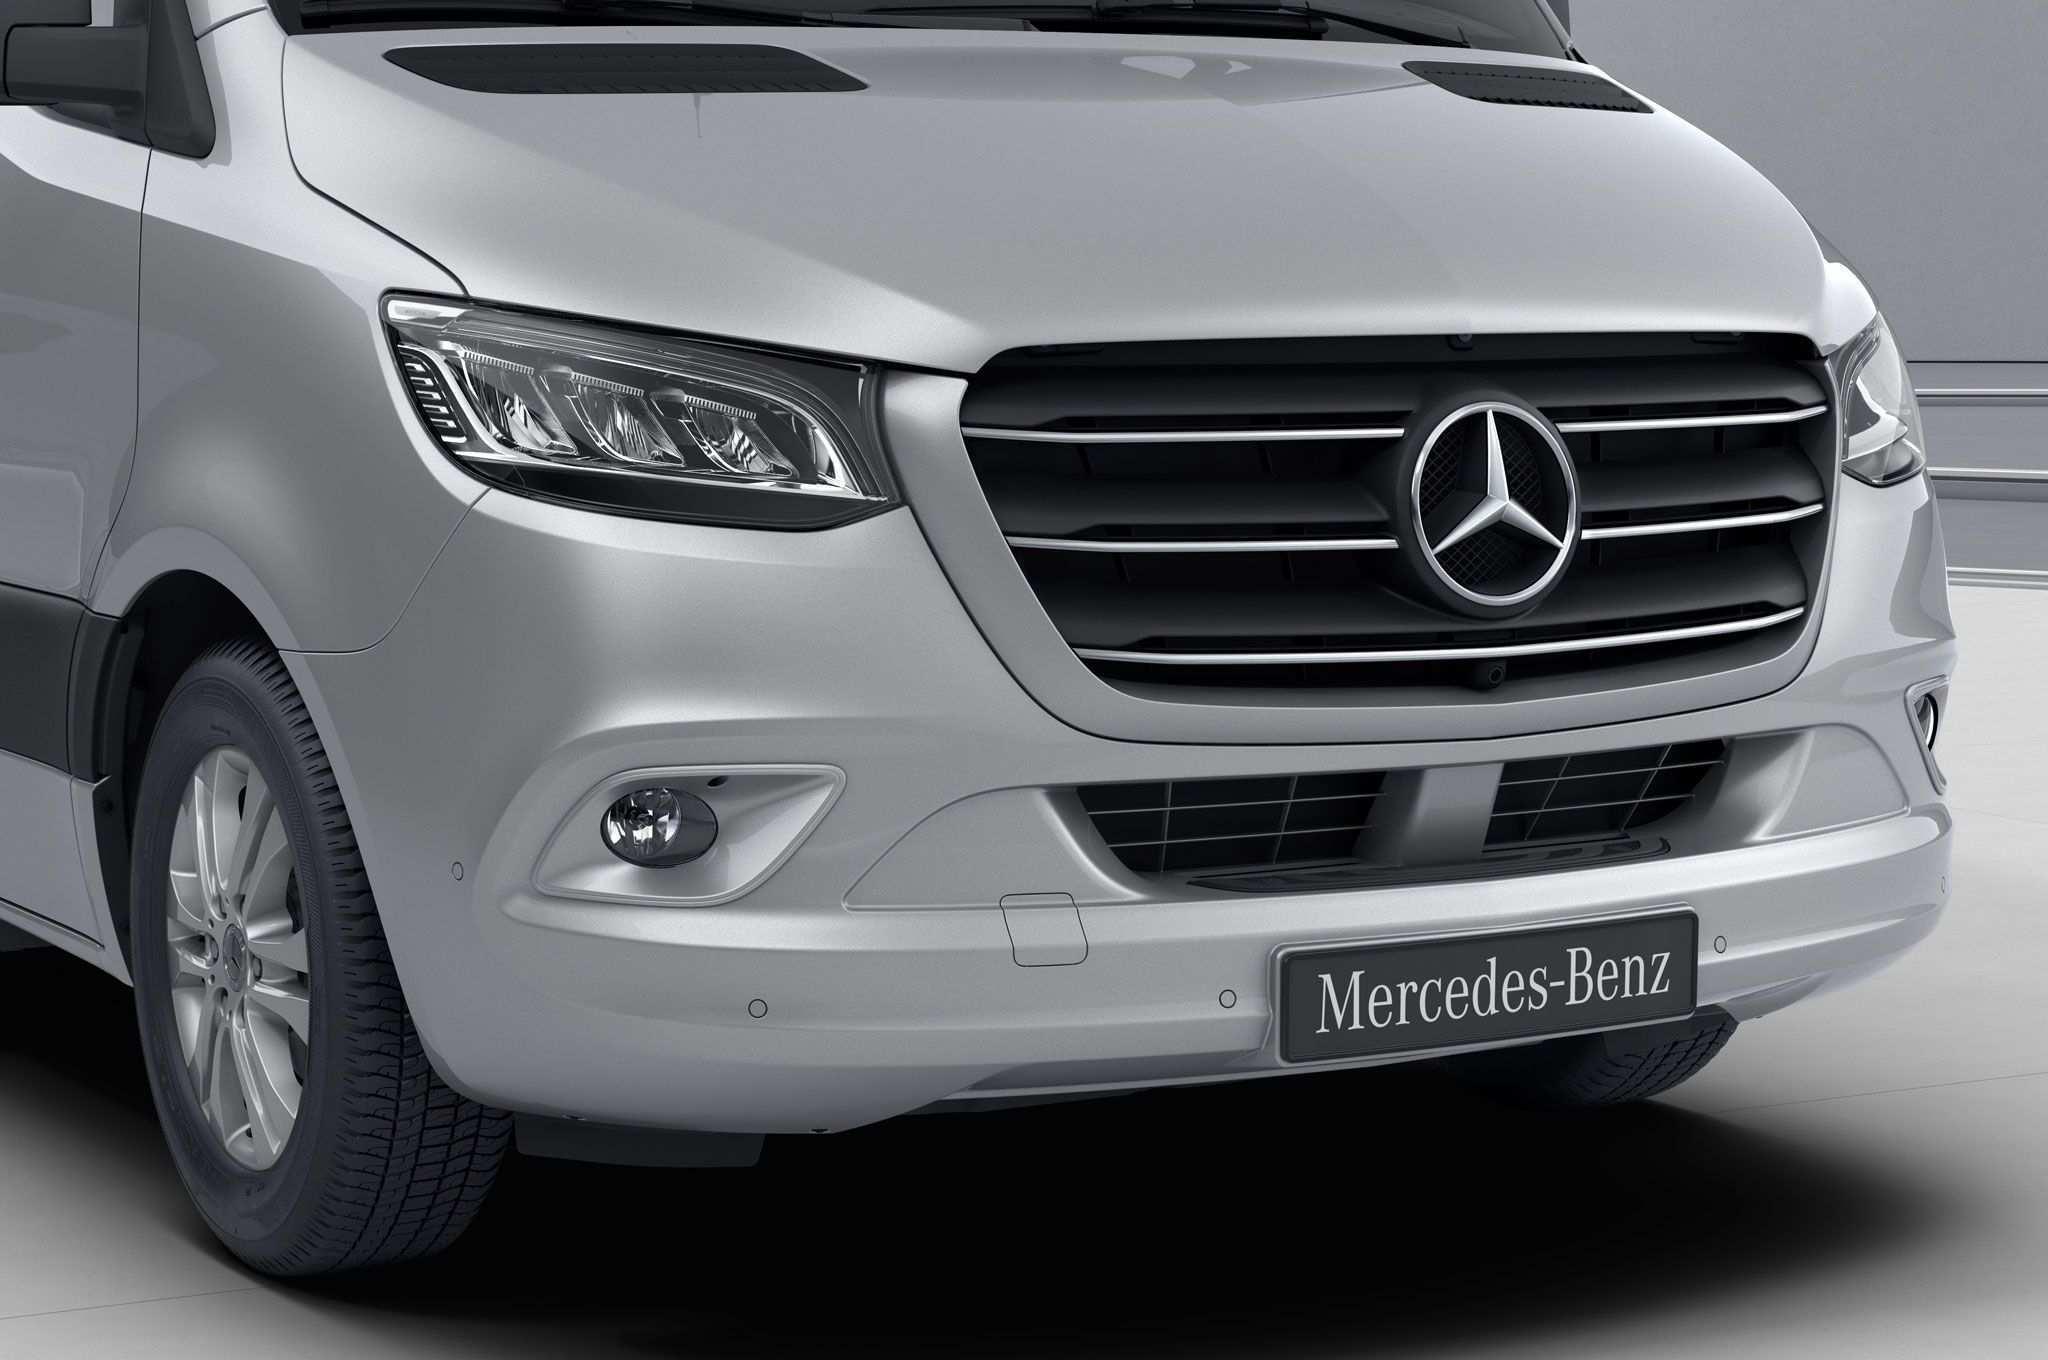 20 All New Mercedes Vito 2019 Release with Mercedes Vito 2019